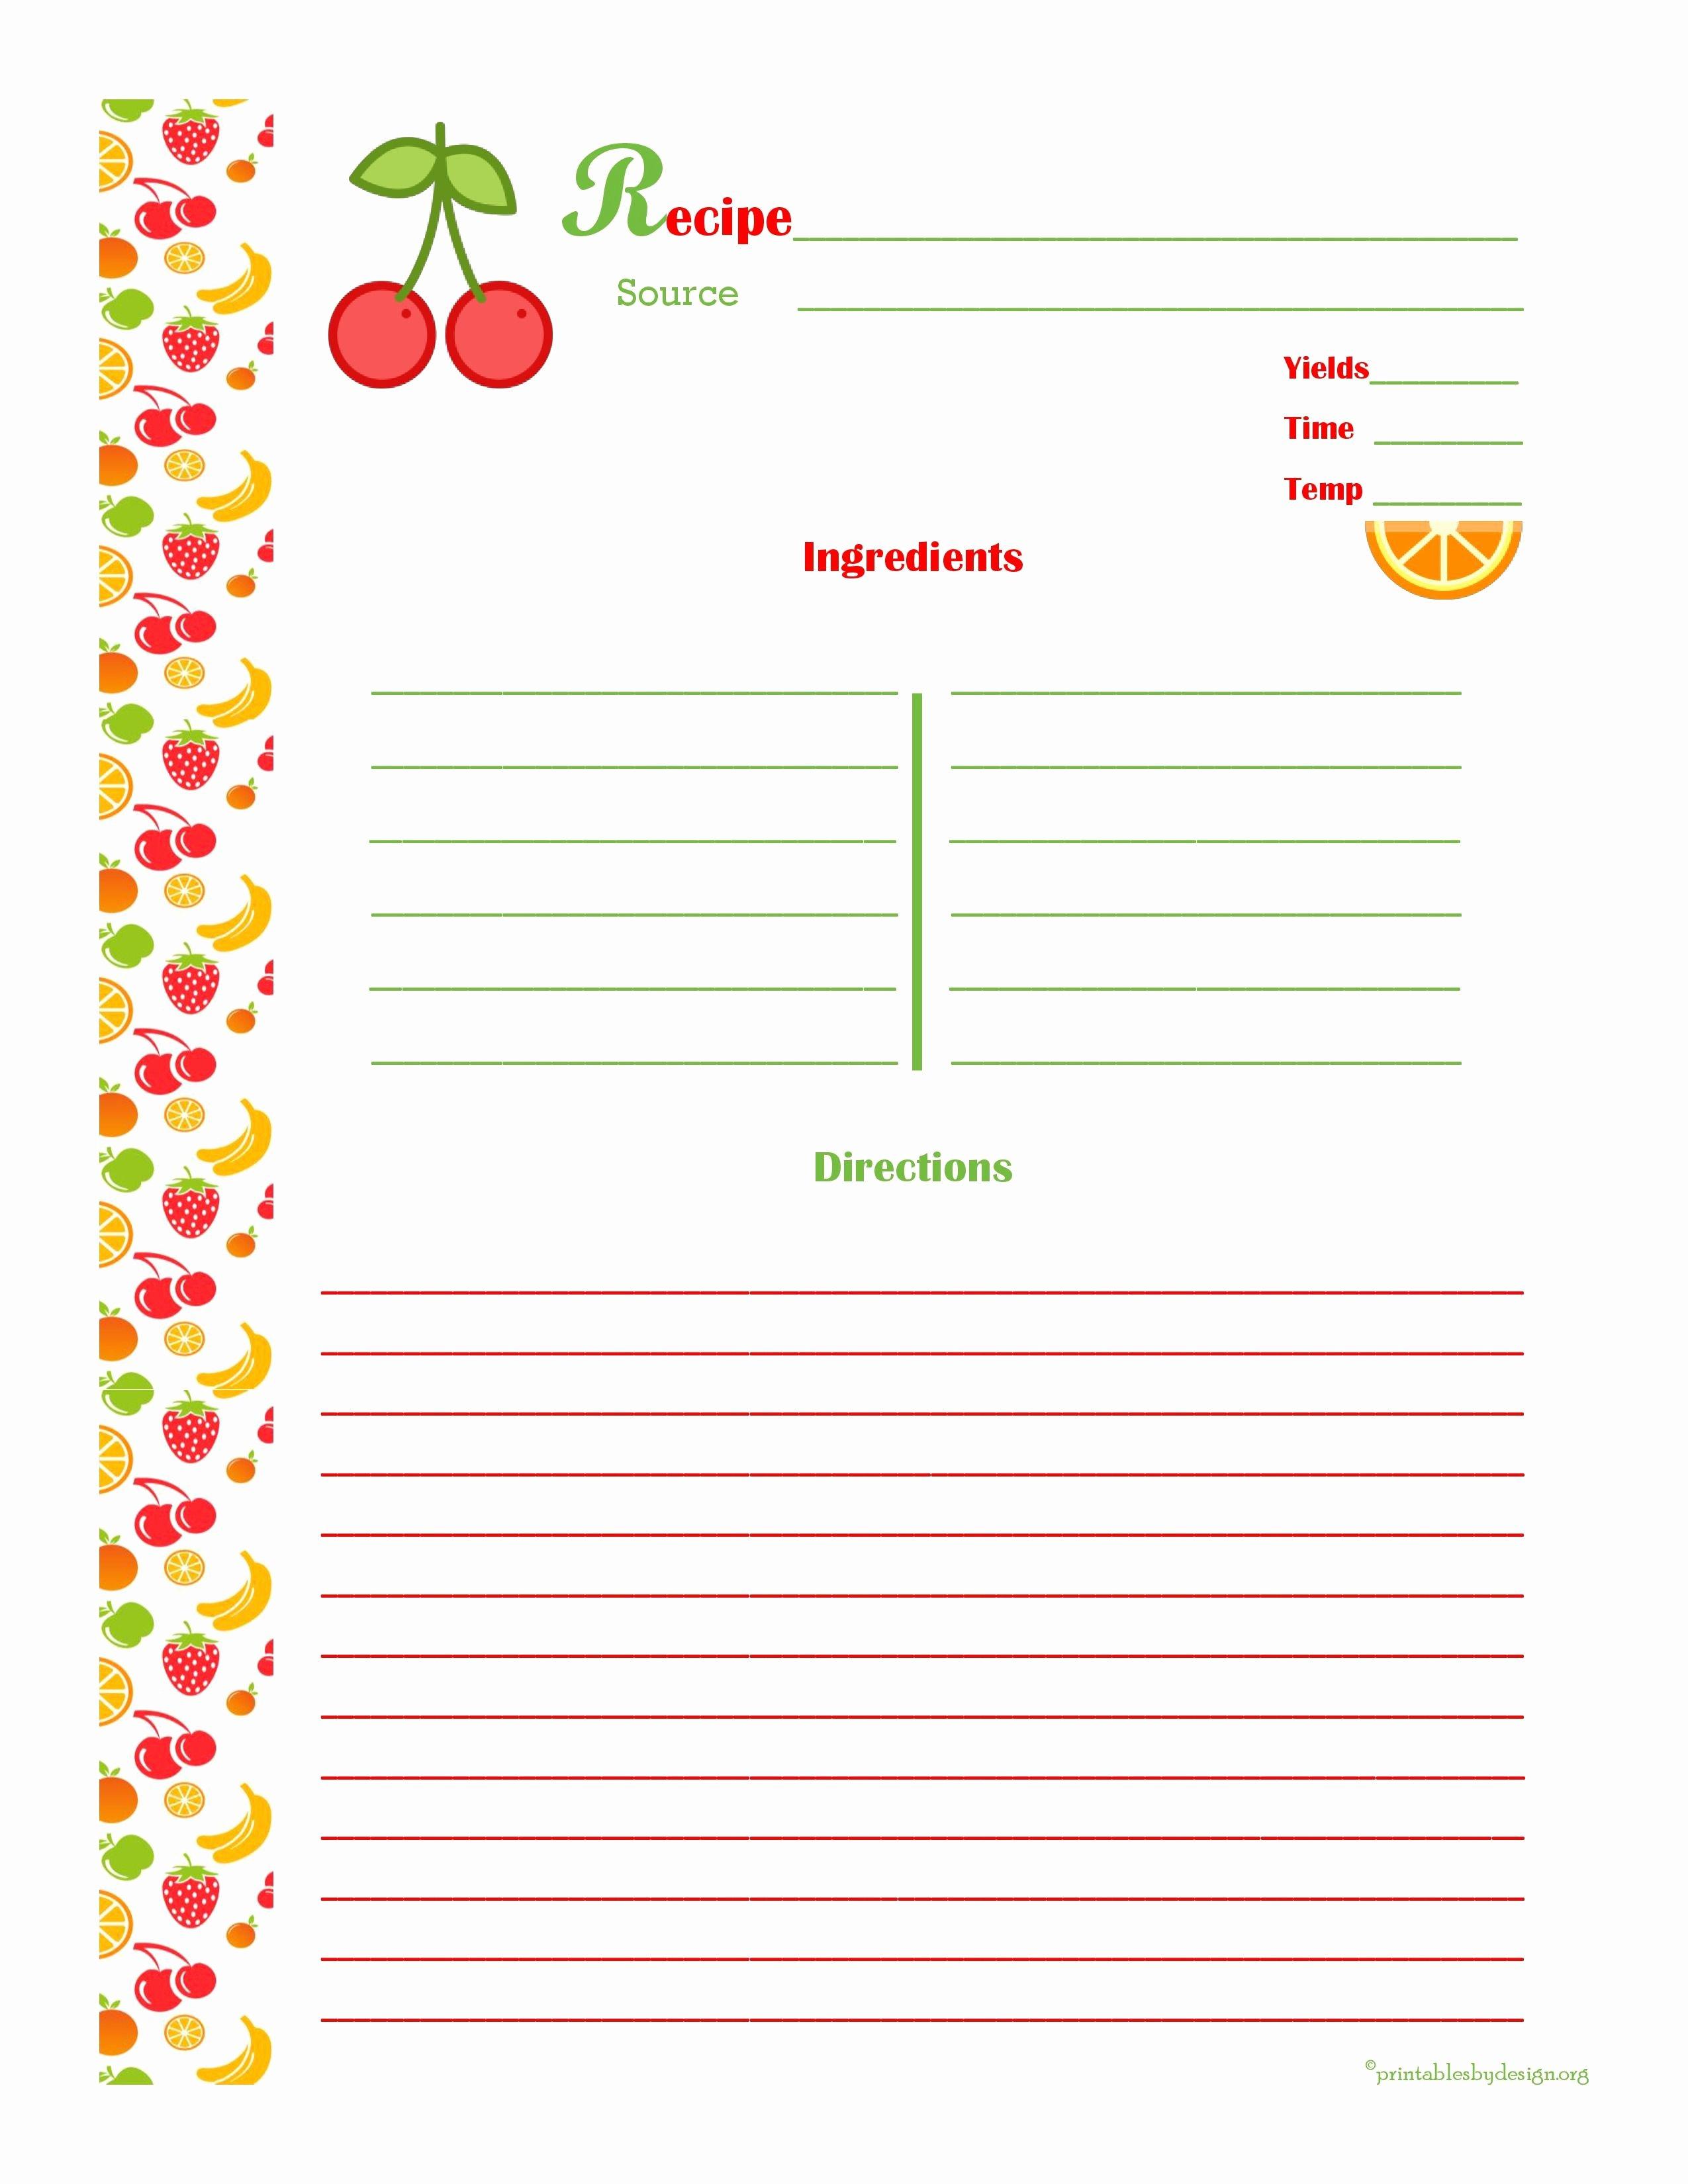 Cherry & orange Recipe Card Full Page